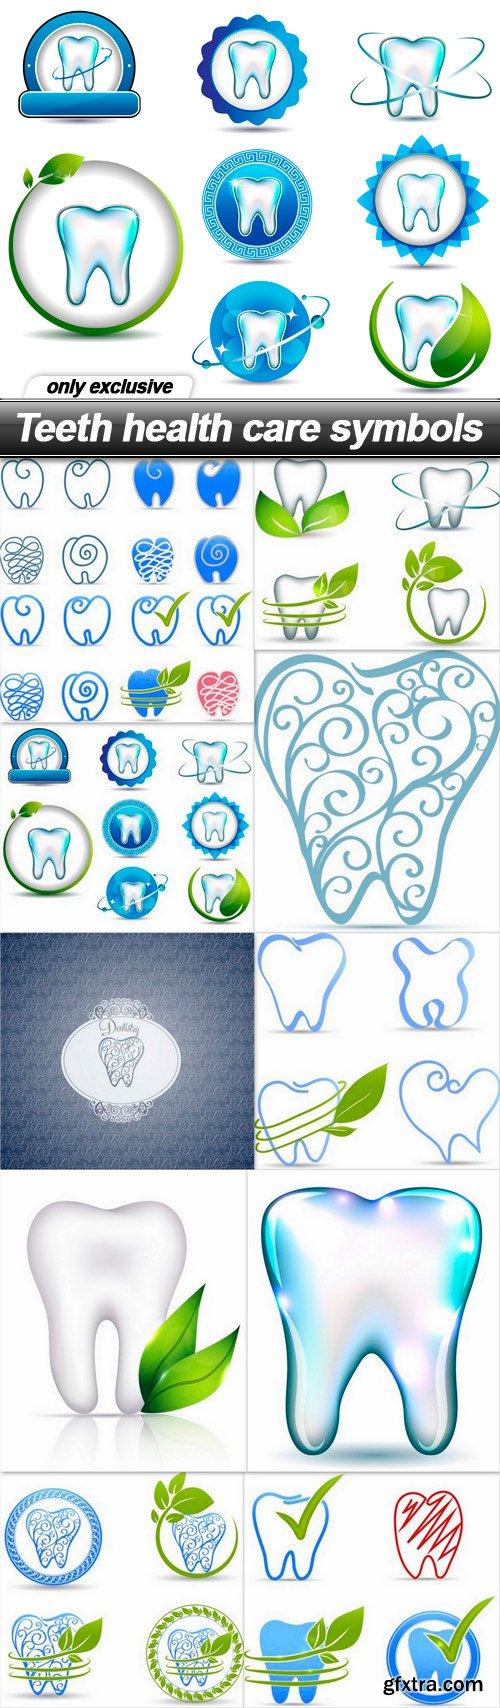 Teeth health care symbols - 10 EPS